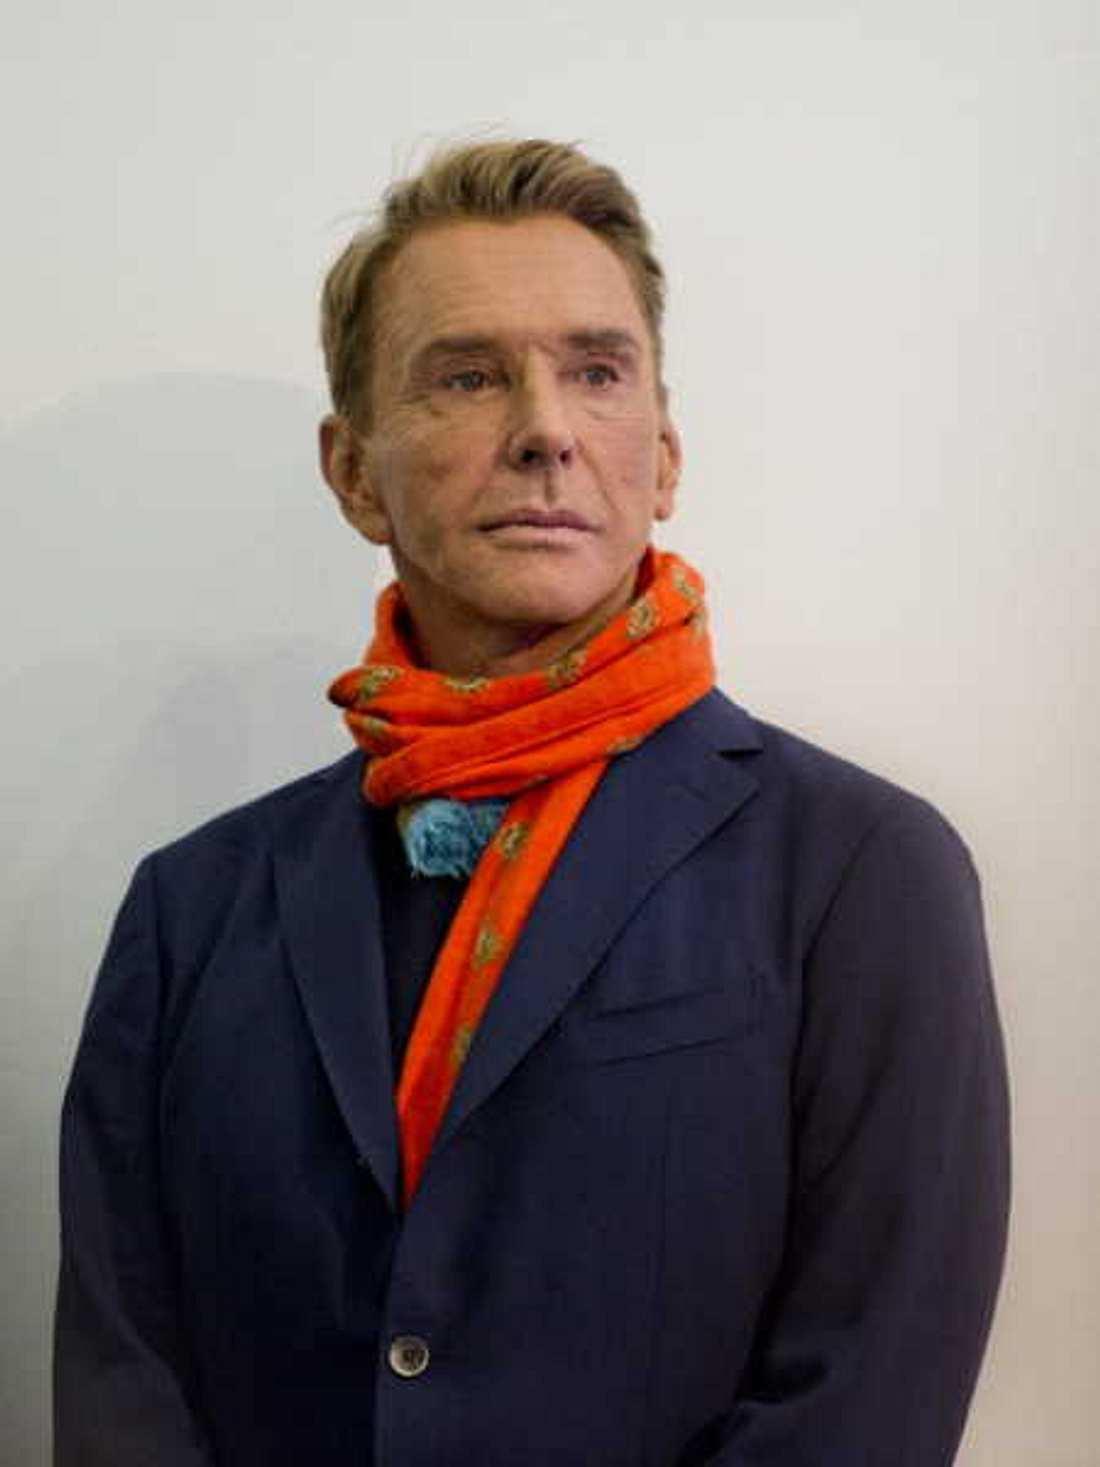 Wolfgang Joop trauert um seinen Hund Lottchen